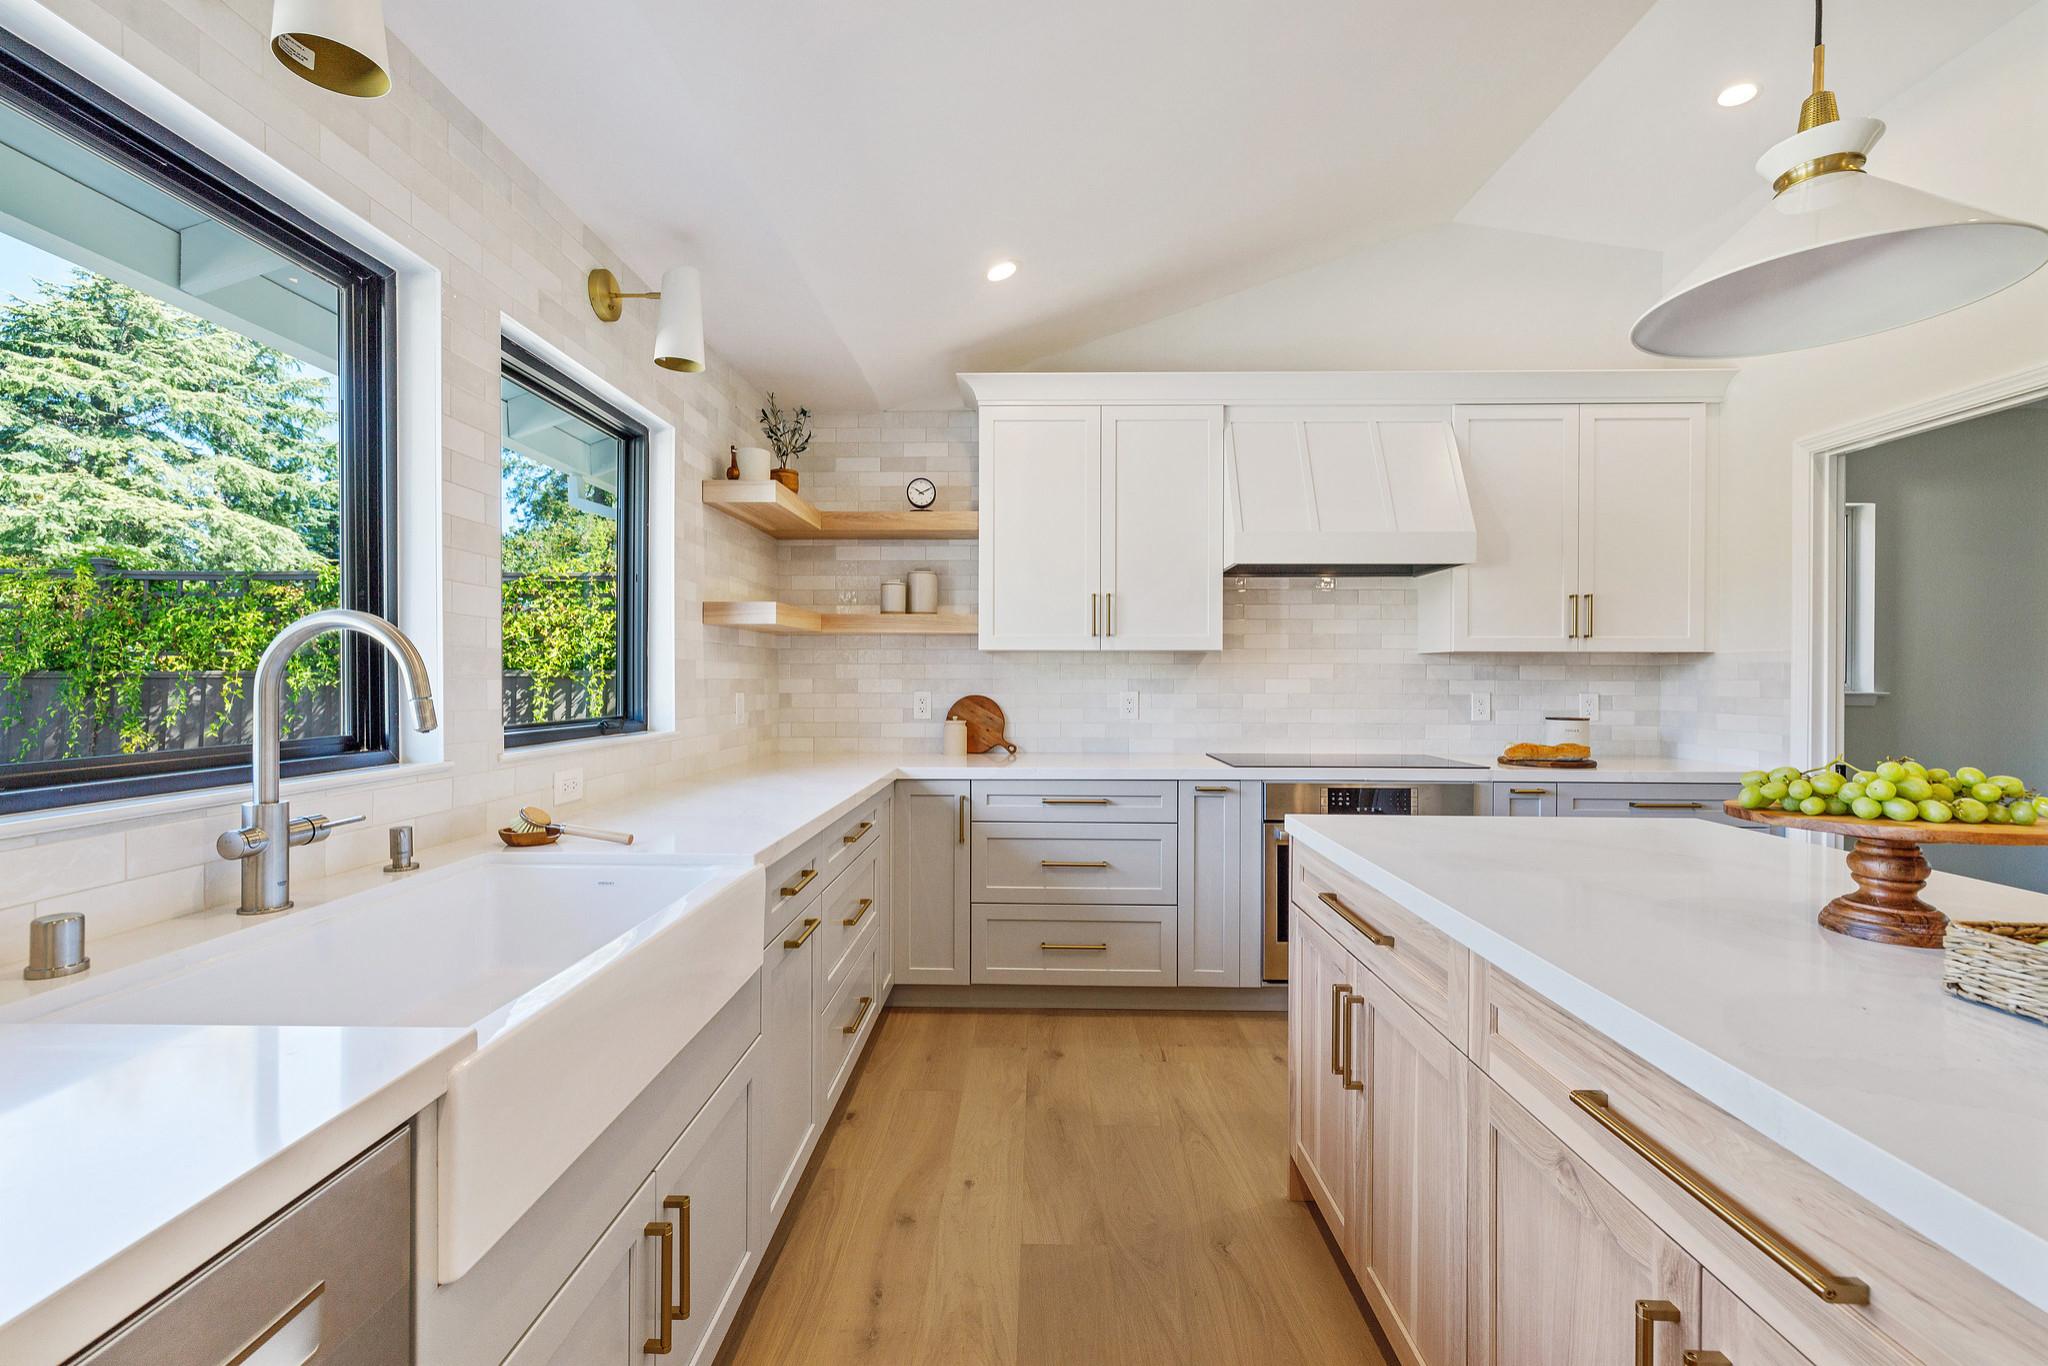 Home Remodel Saratoga